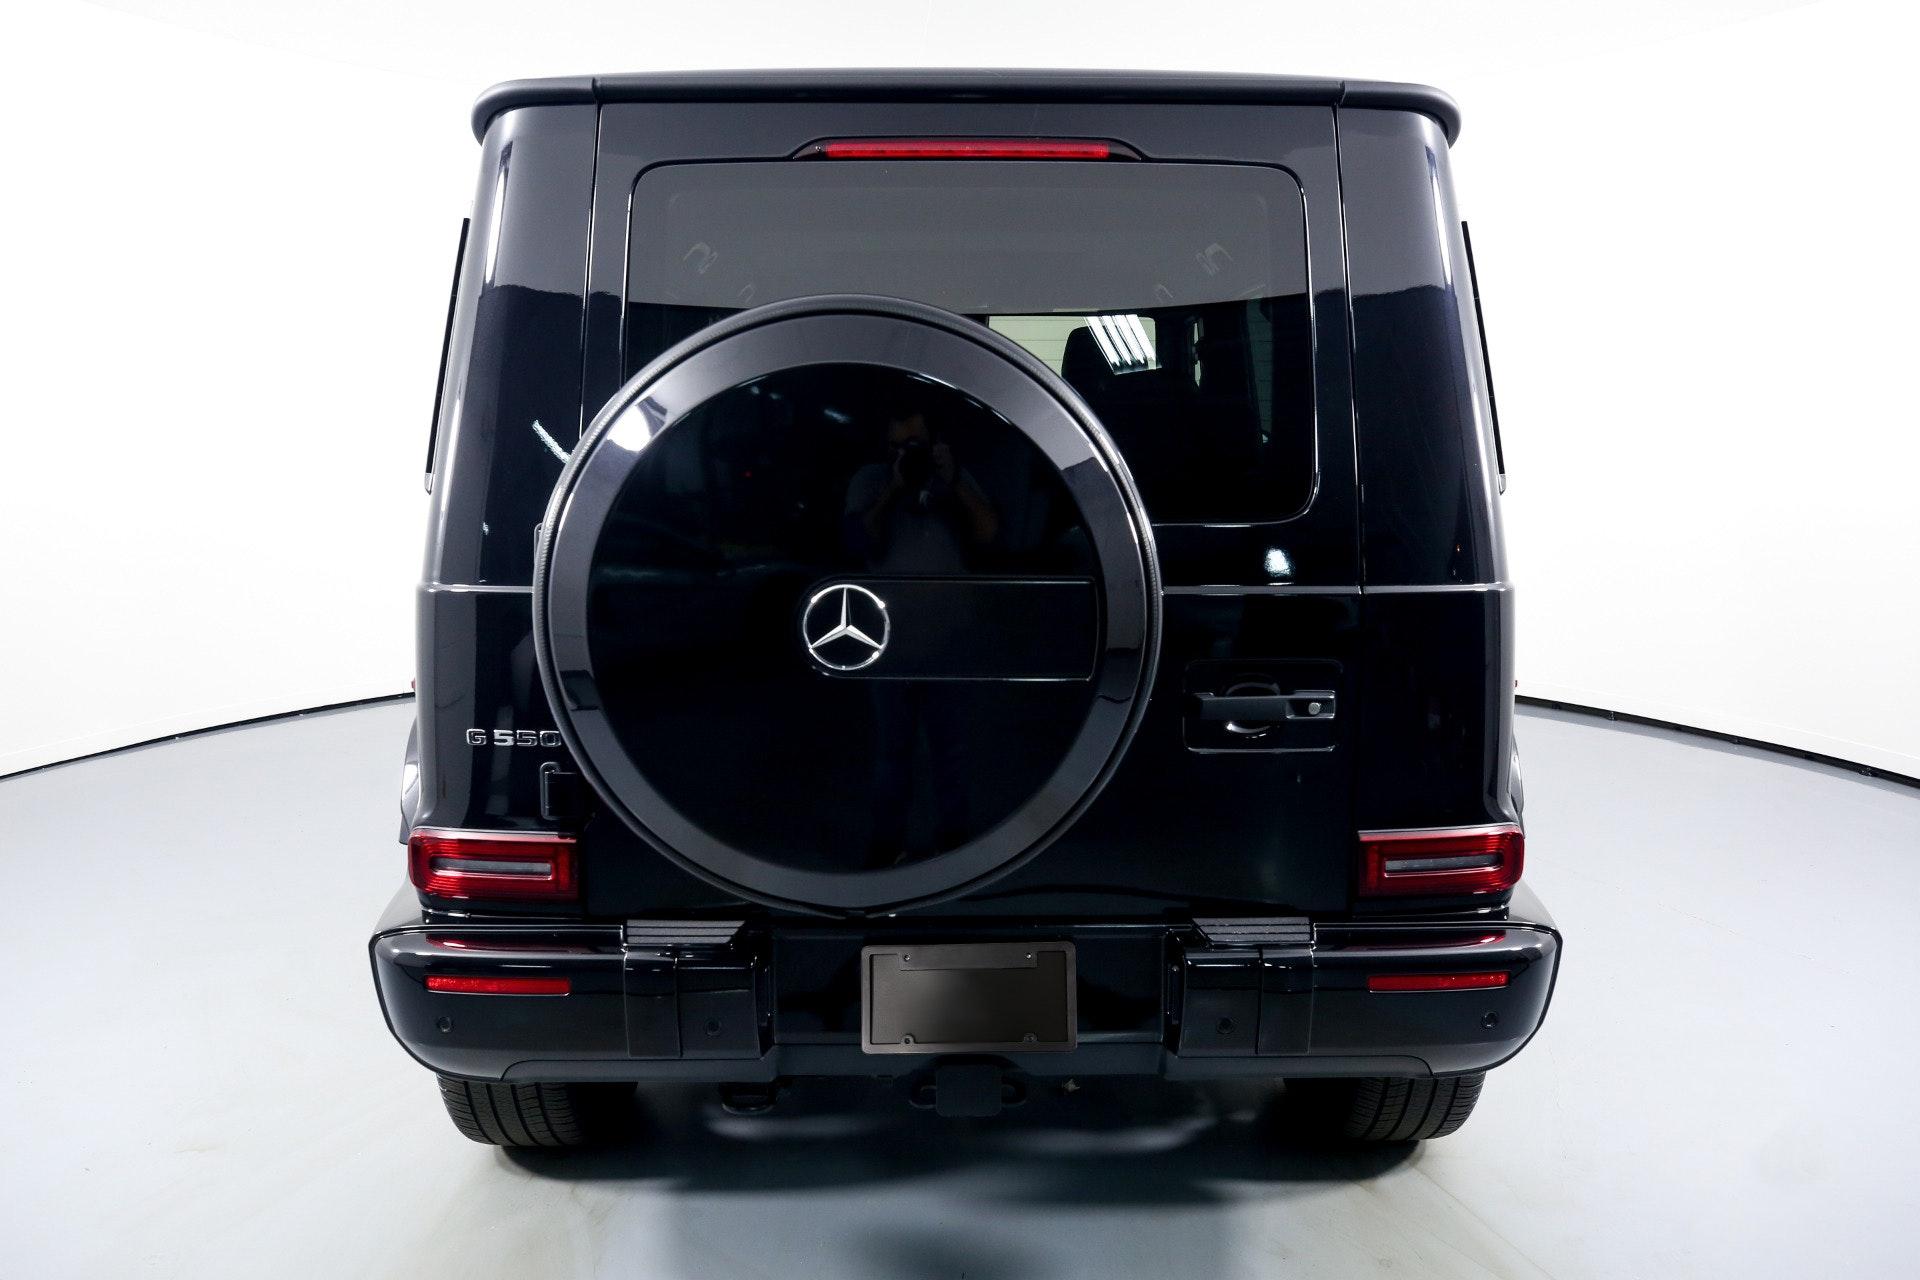 Miami Mercedes-Benz G550 image #2